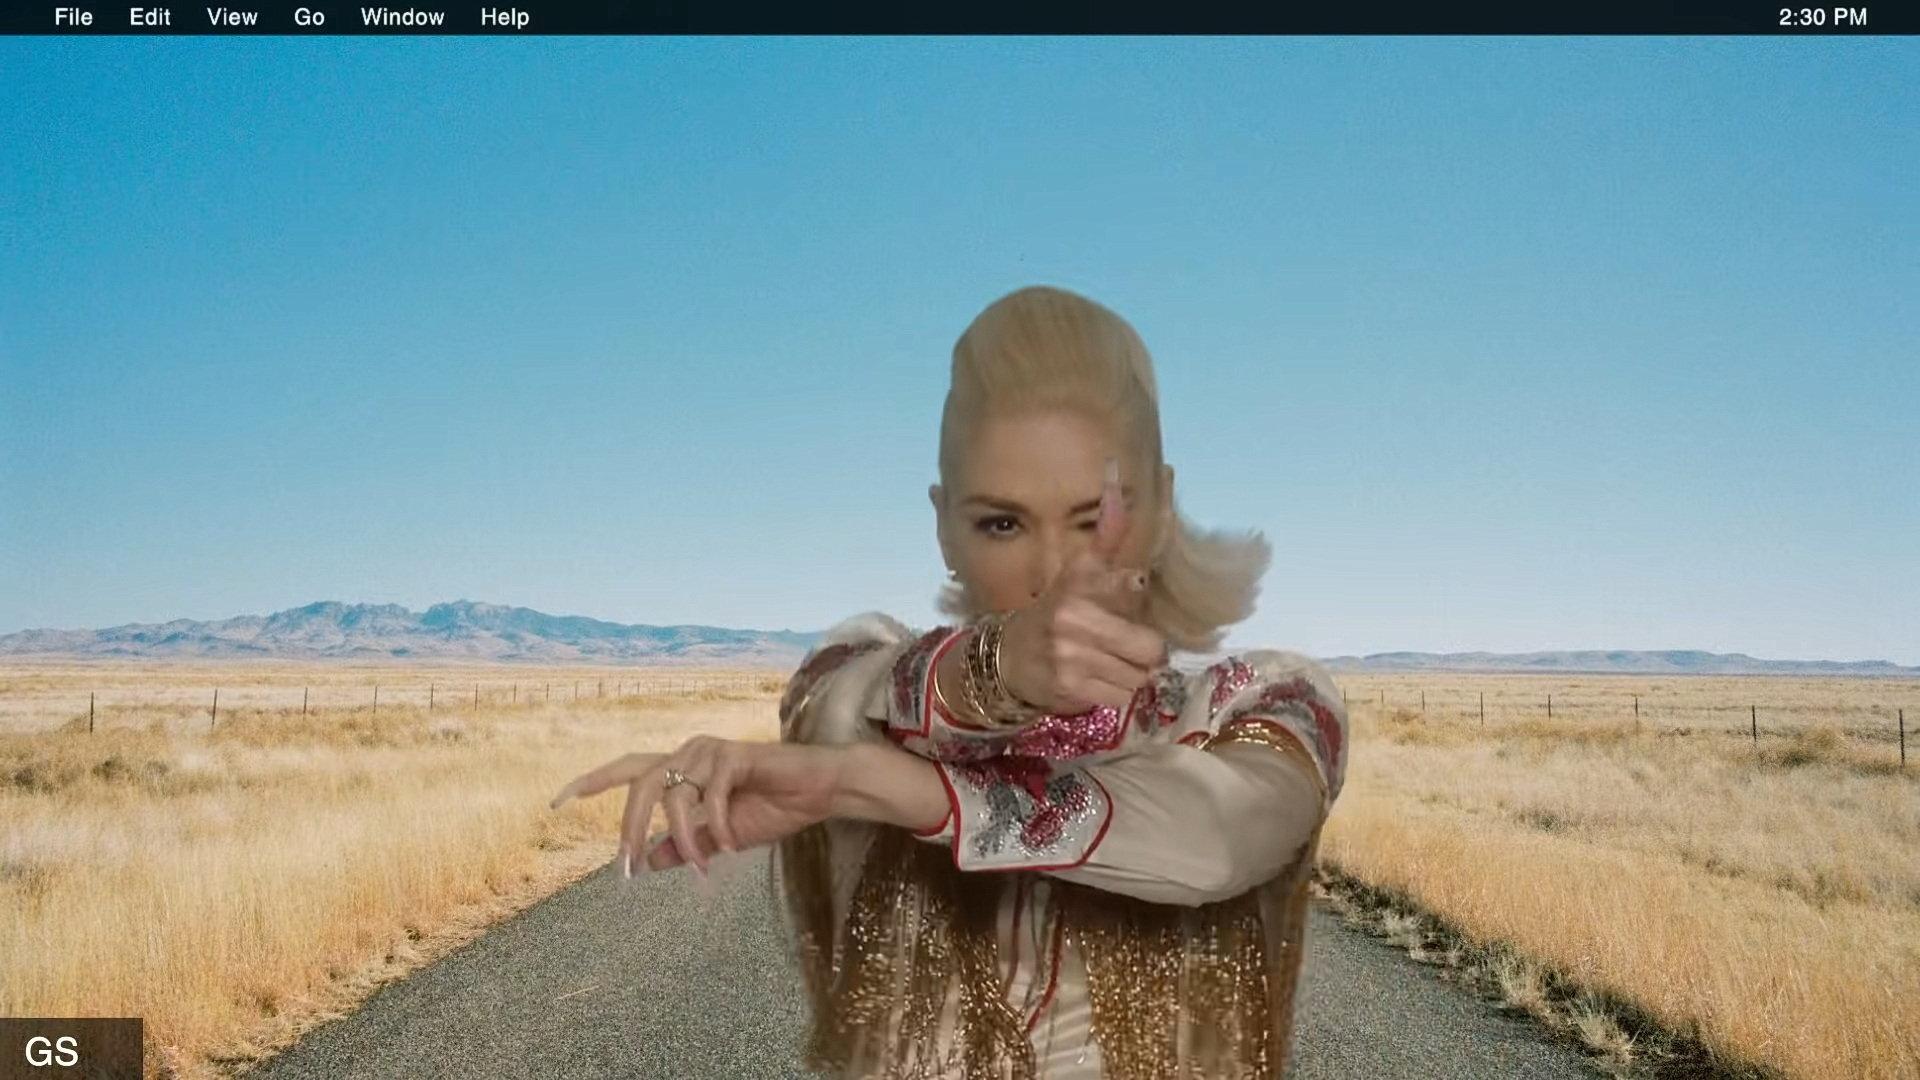 Gwen Stefani - Let Me Reintroduce Myself (Official Video) 2-36 Screenshot